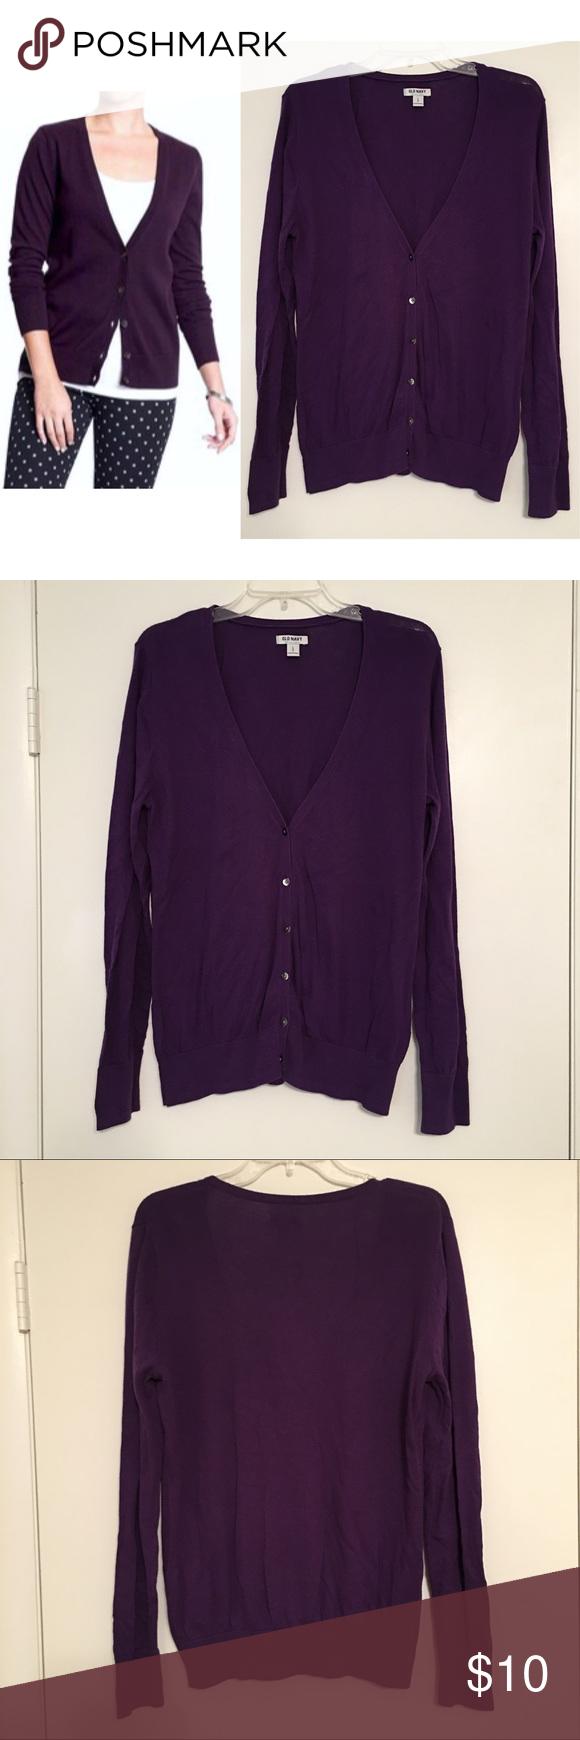 Old Navy Dark Purple V-Neck Cardigan | Navy, Sweater cardigan and ...